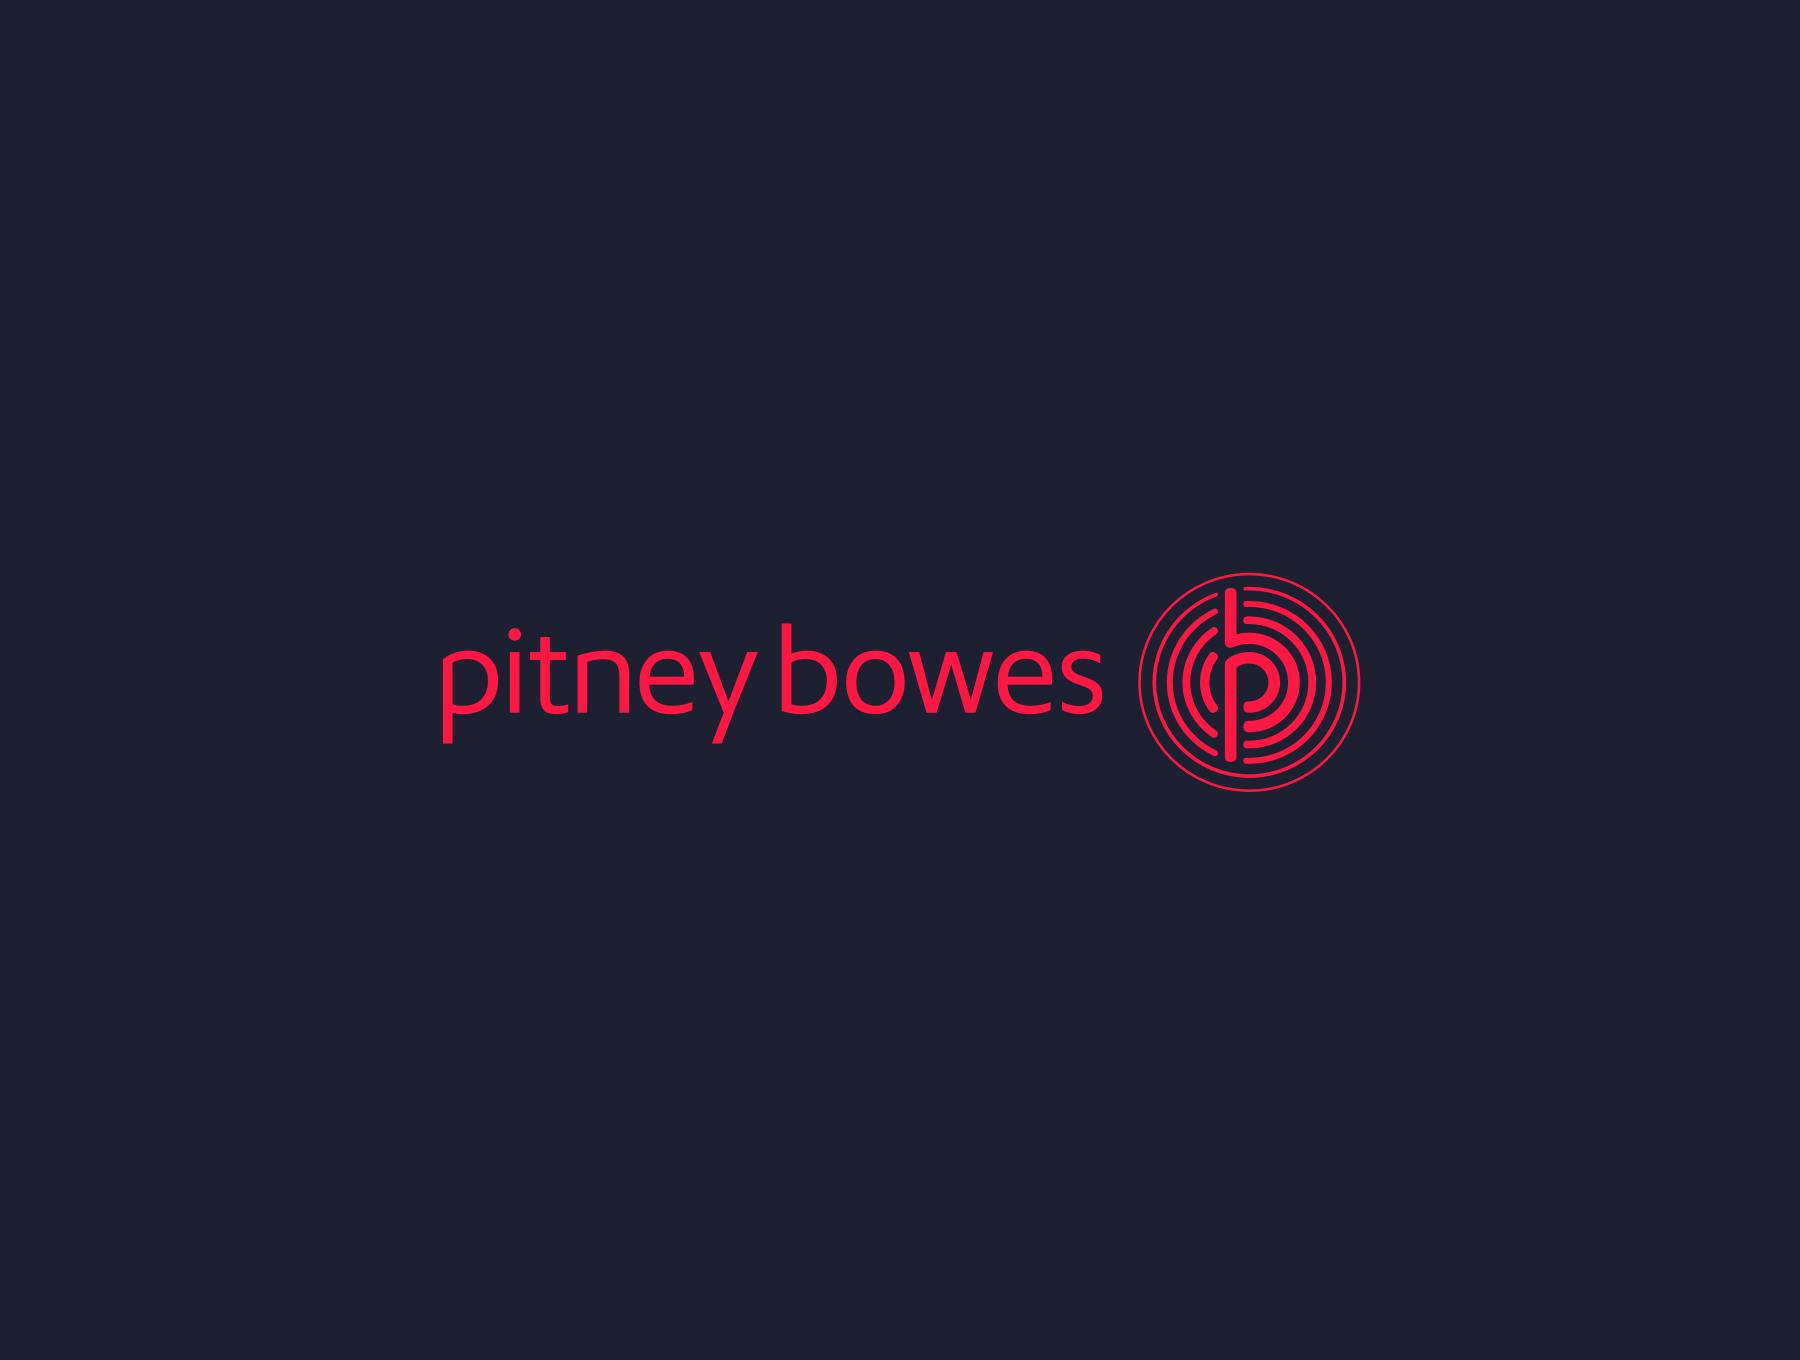 thumbnail-pitneybowes@2x.png